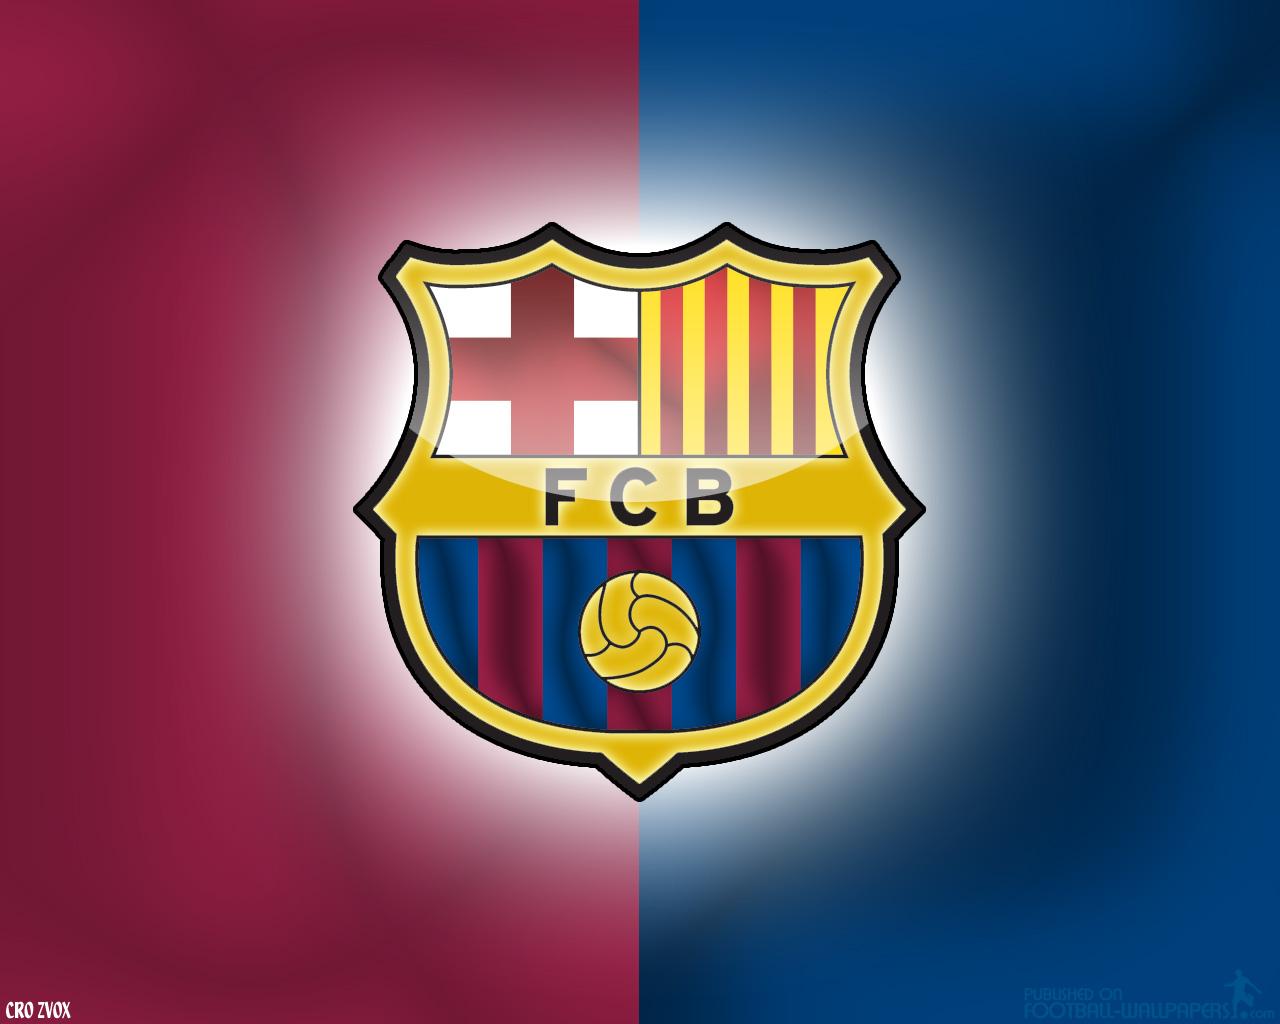 48 hd fc barcelona wallpaper on wallpapersafari 48 hd fc barcelona wallpaper on